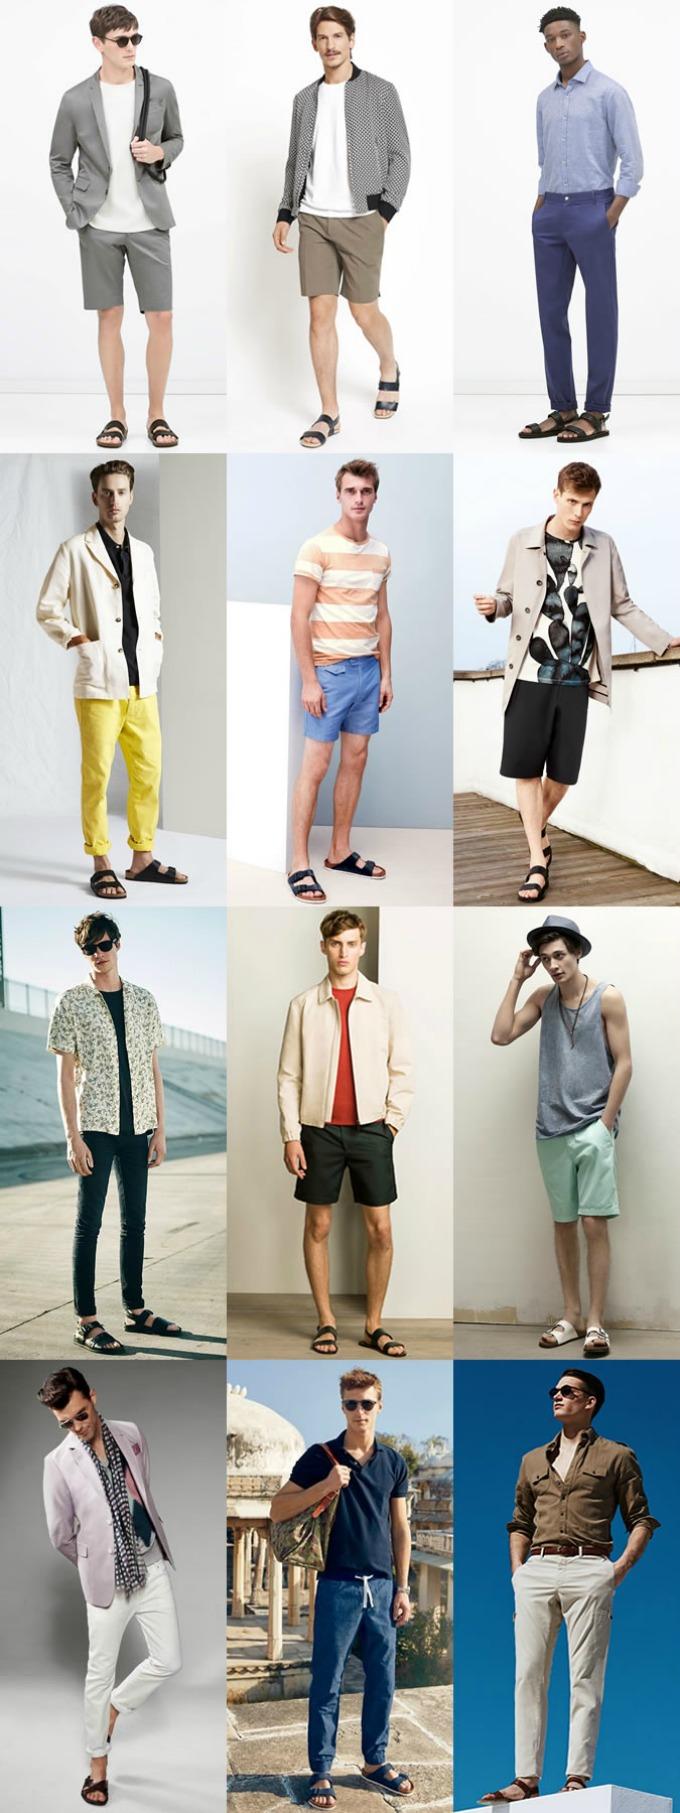 summermythssandals wannabe magazin 5 letnjih stilskih pravila koje ne treba da poštuješ